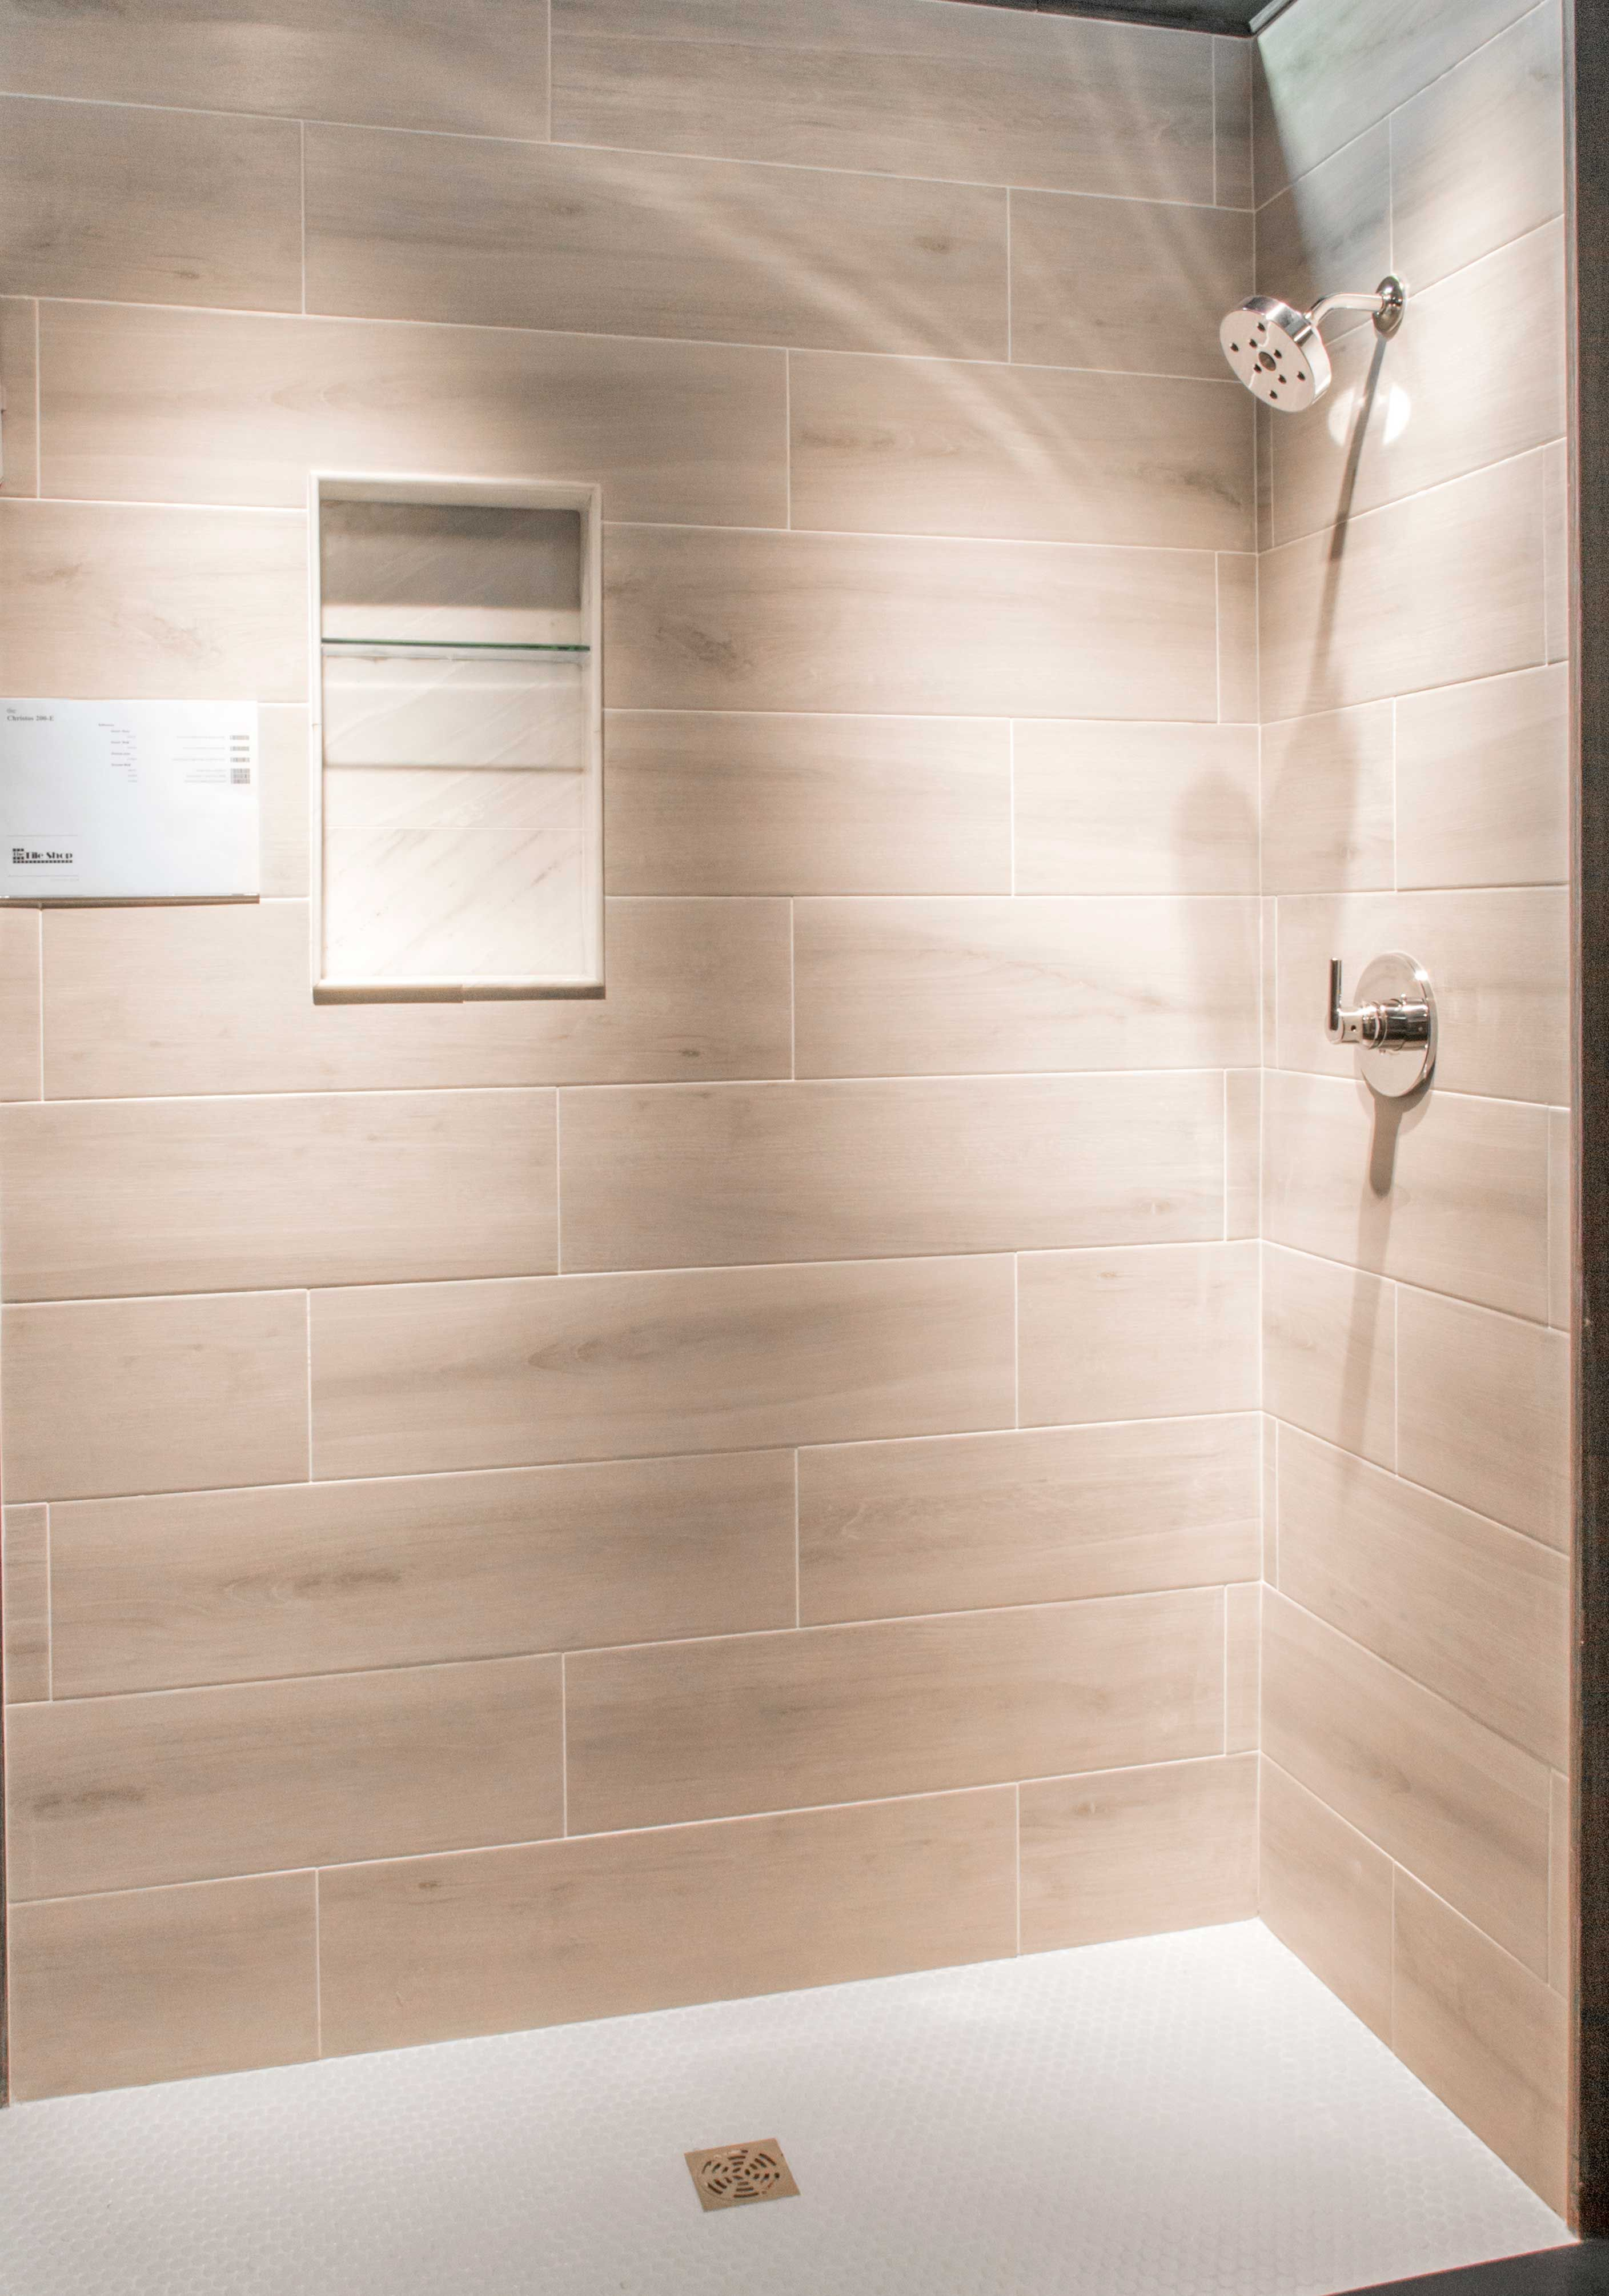 Bathroom shower wall tile